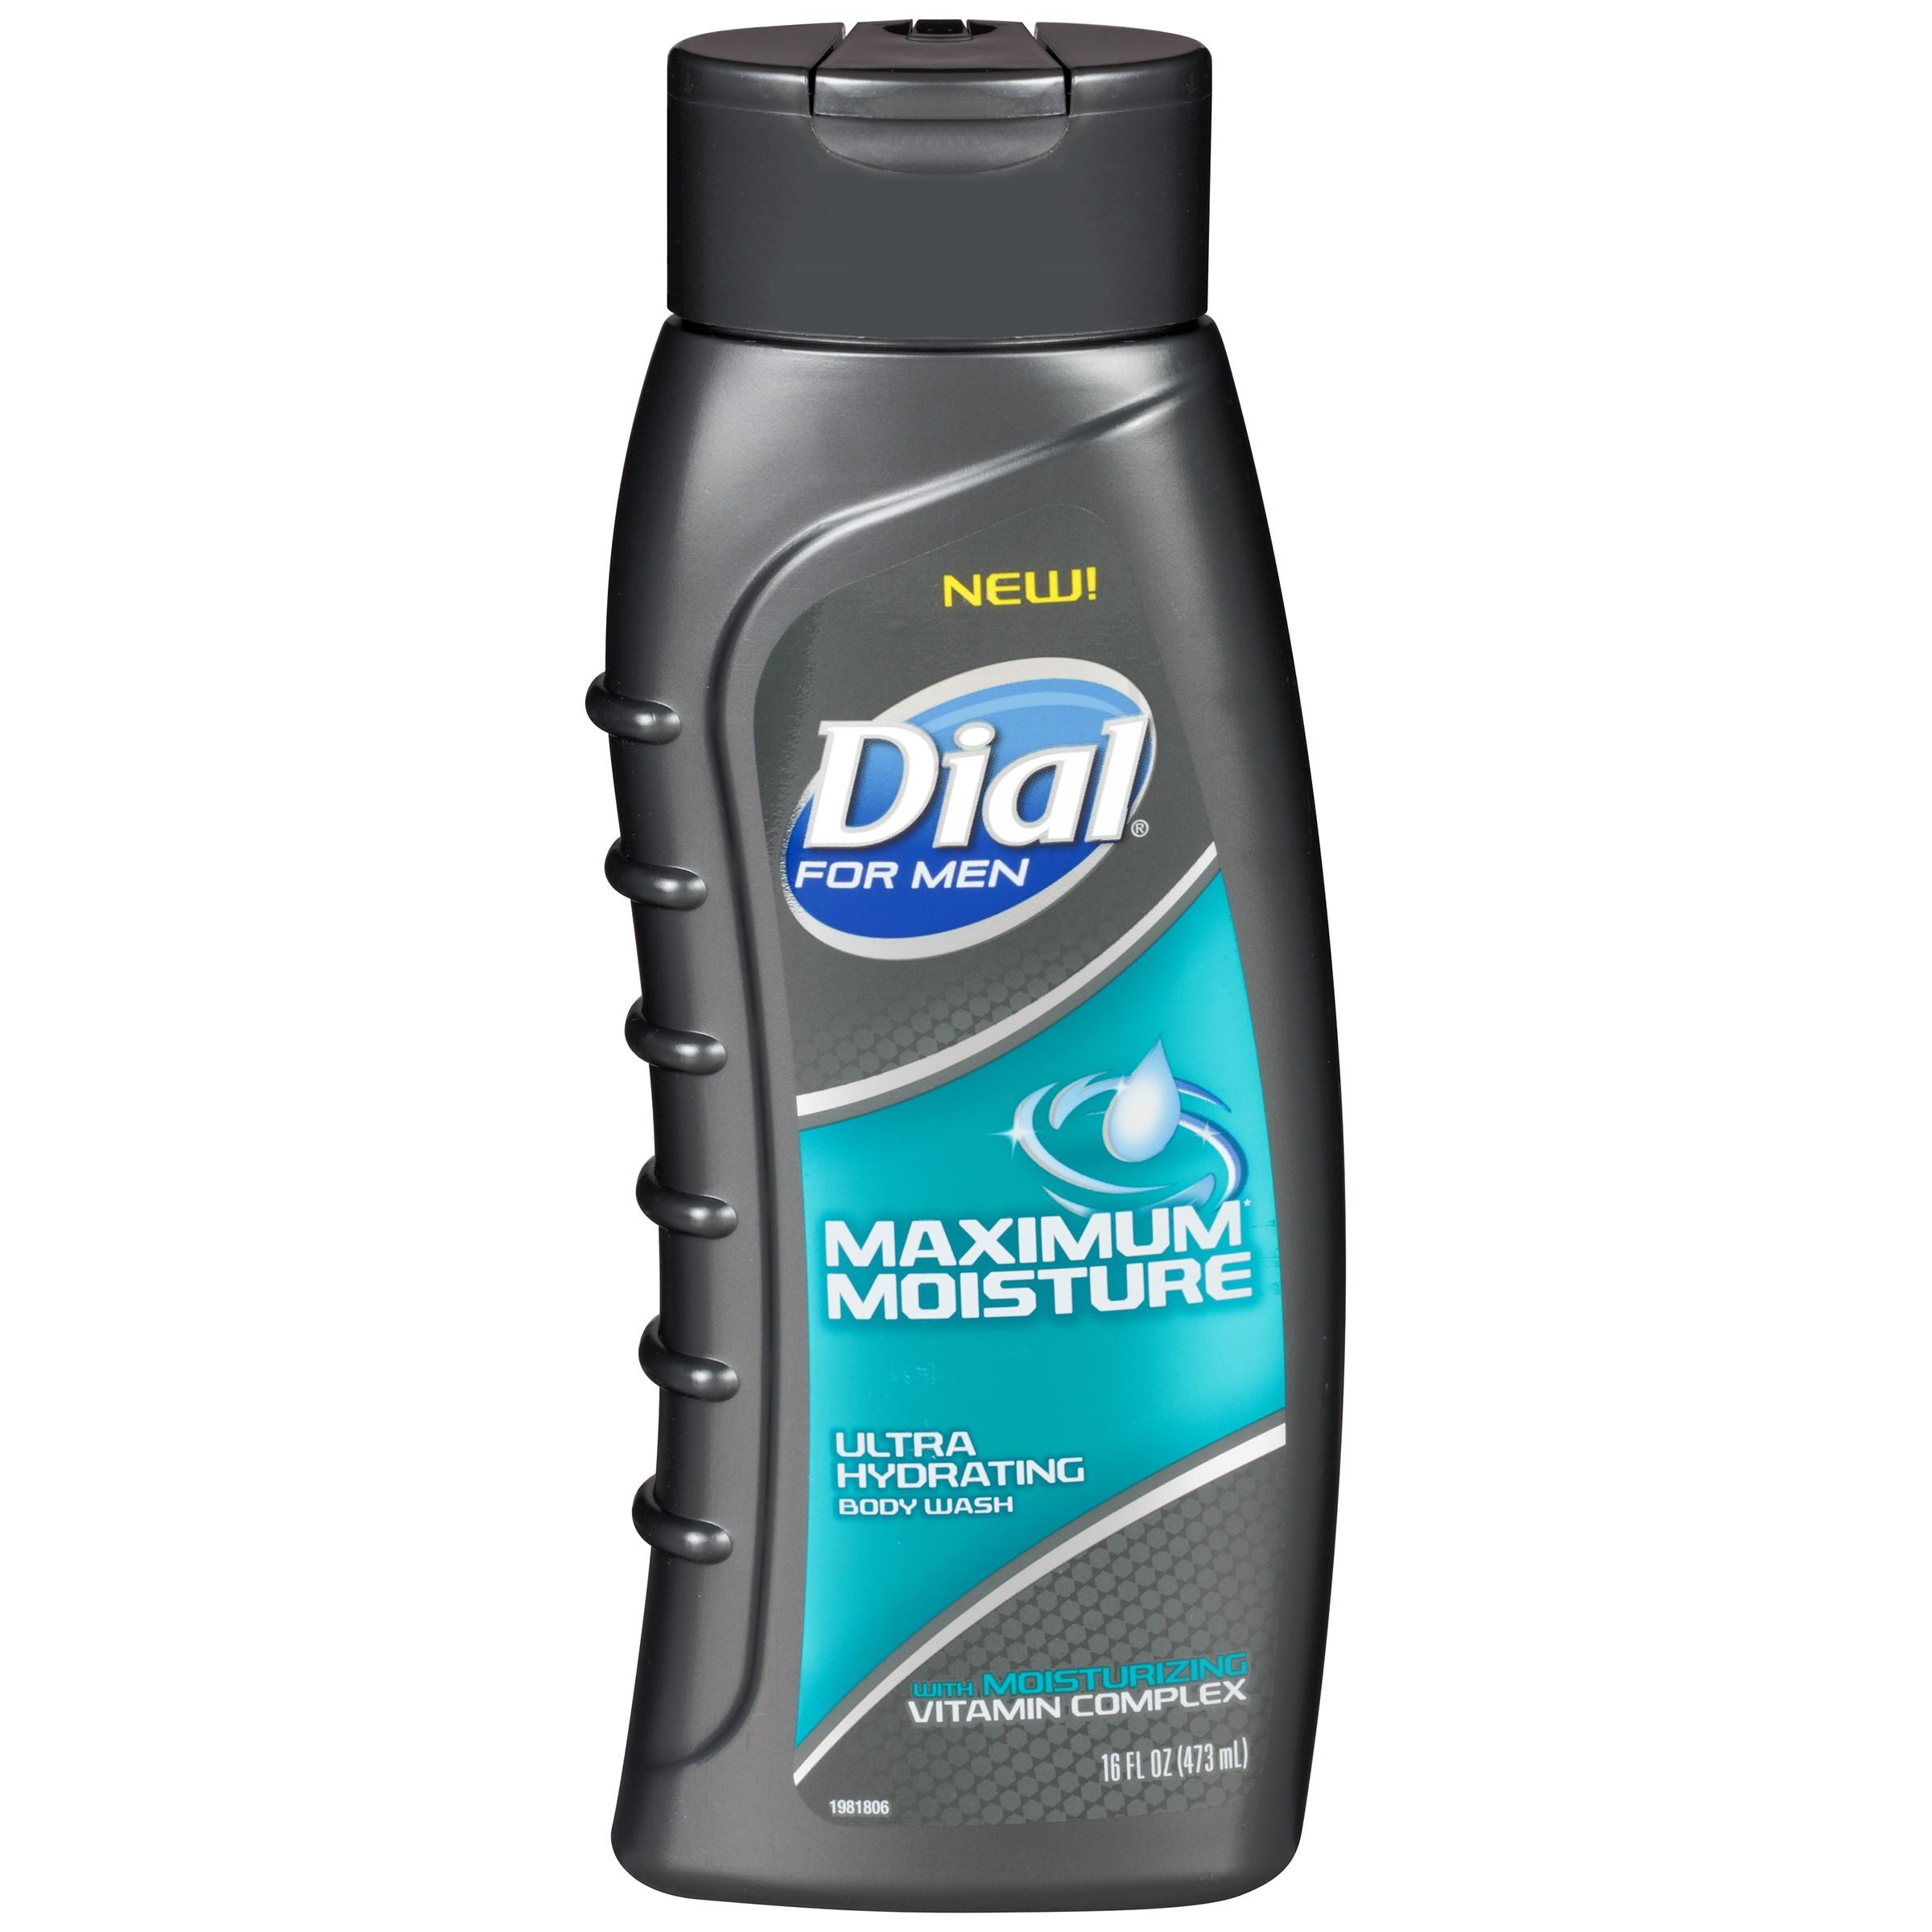 Dial for Men Body Wash, Maximum Moisture, 16 Oz